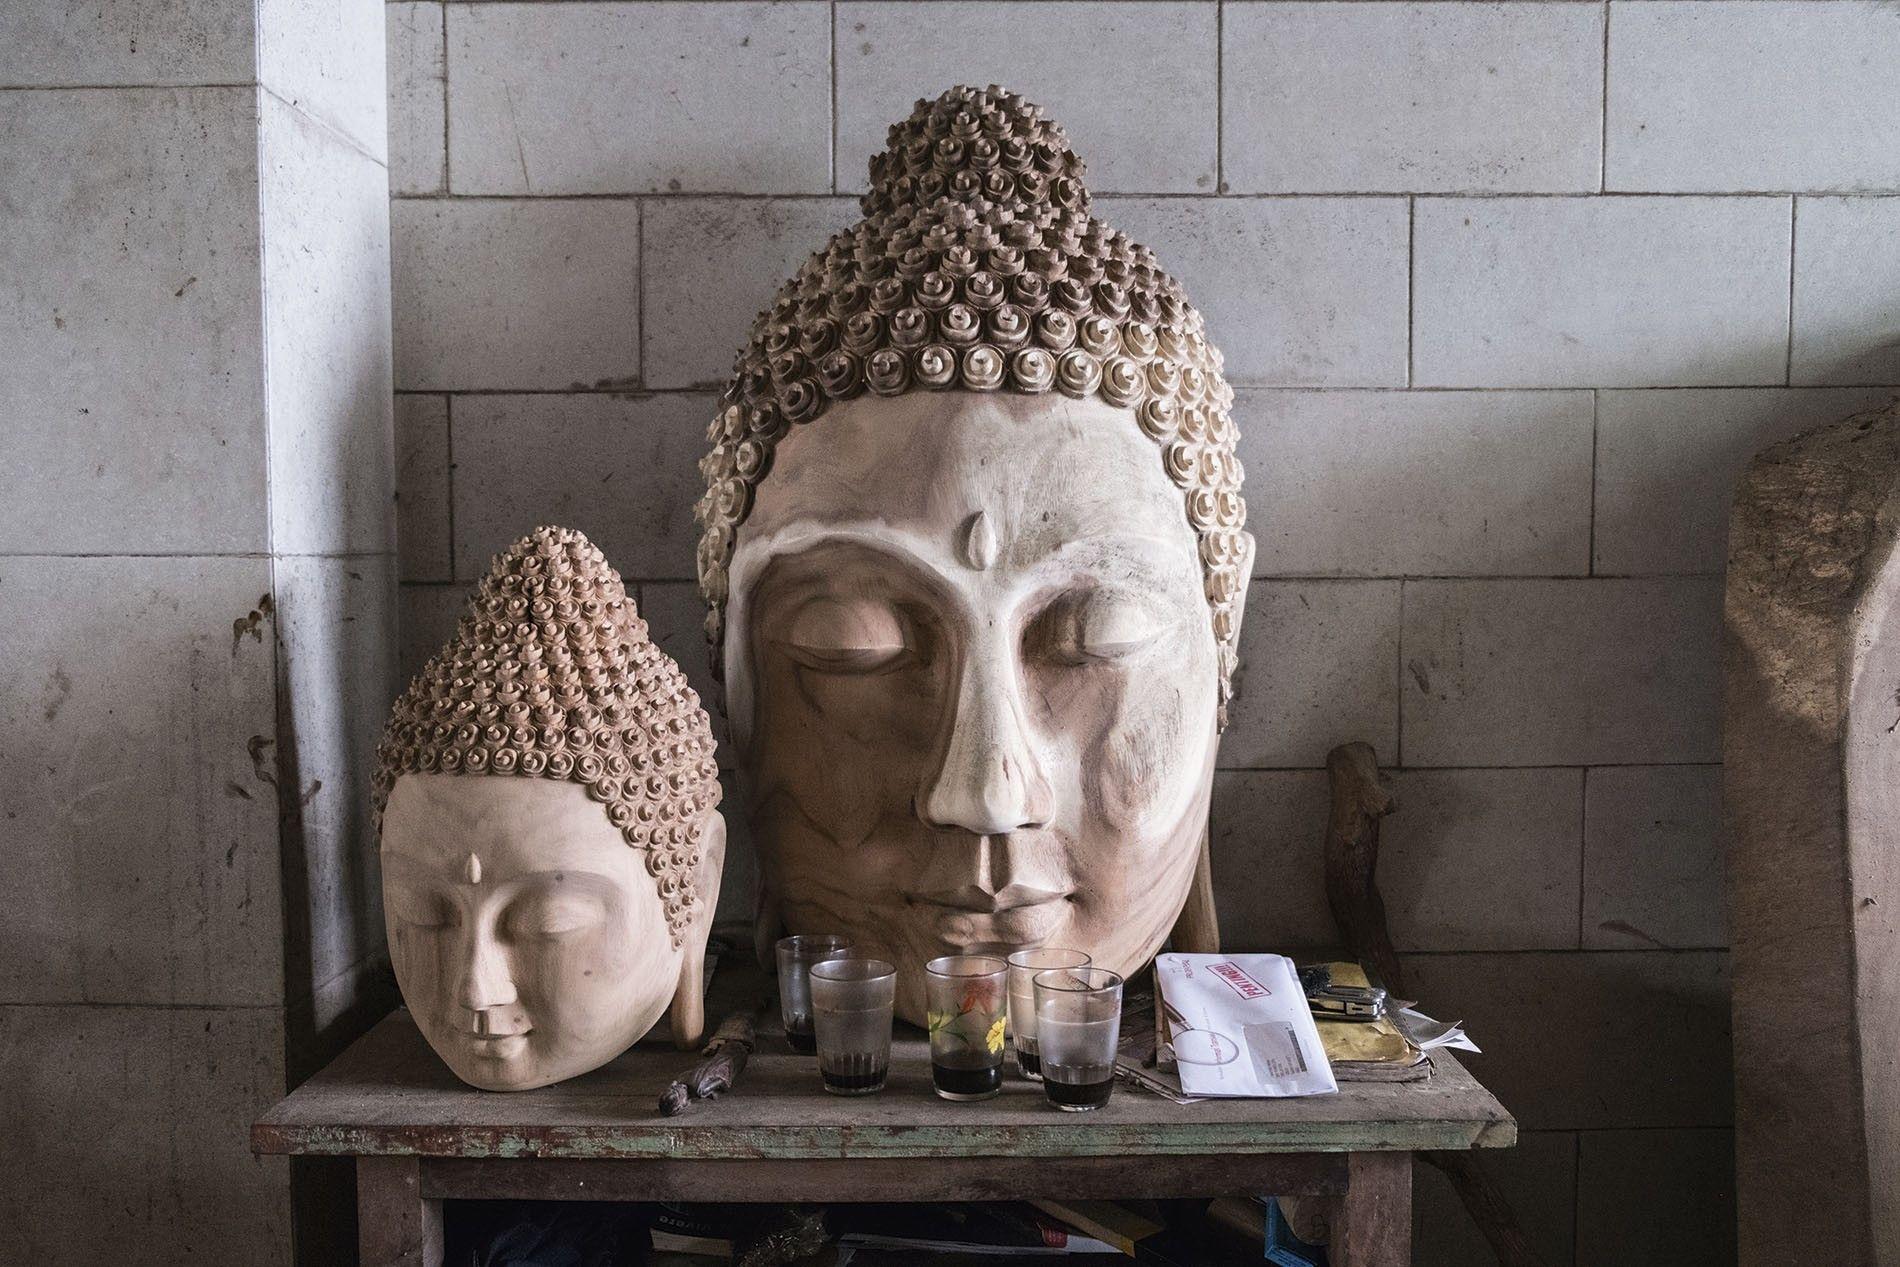 Wood carving, Taksu Bali Art Gallery, Ubud.